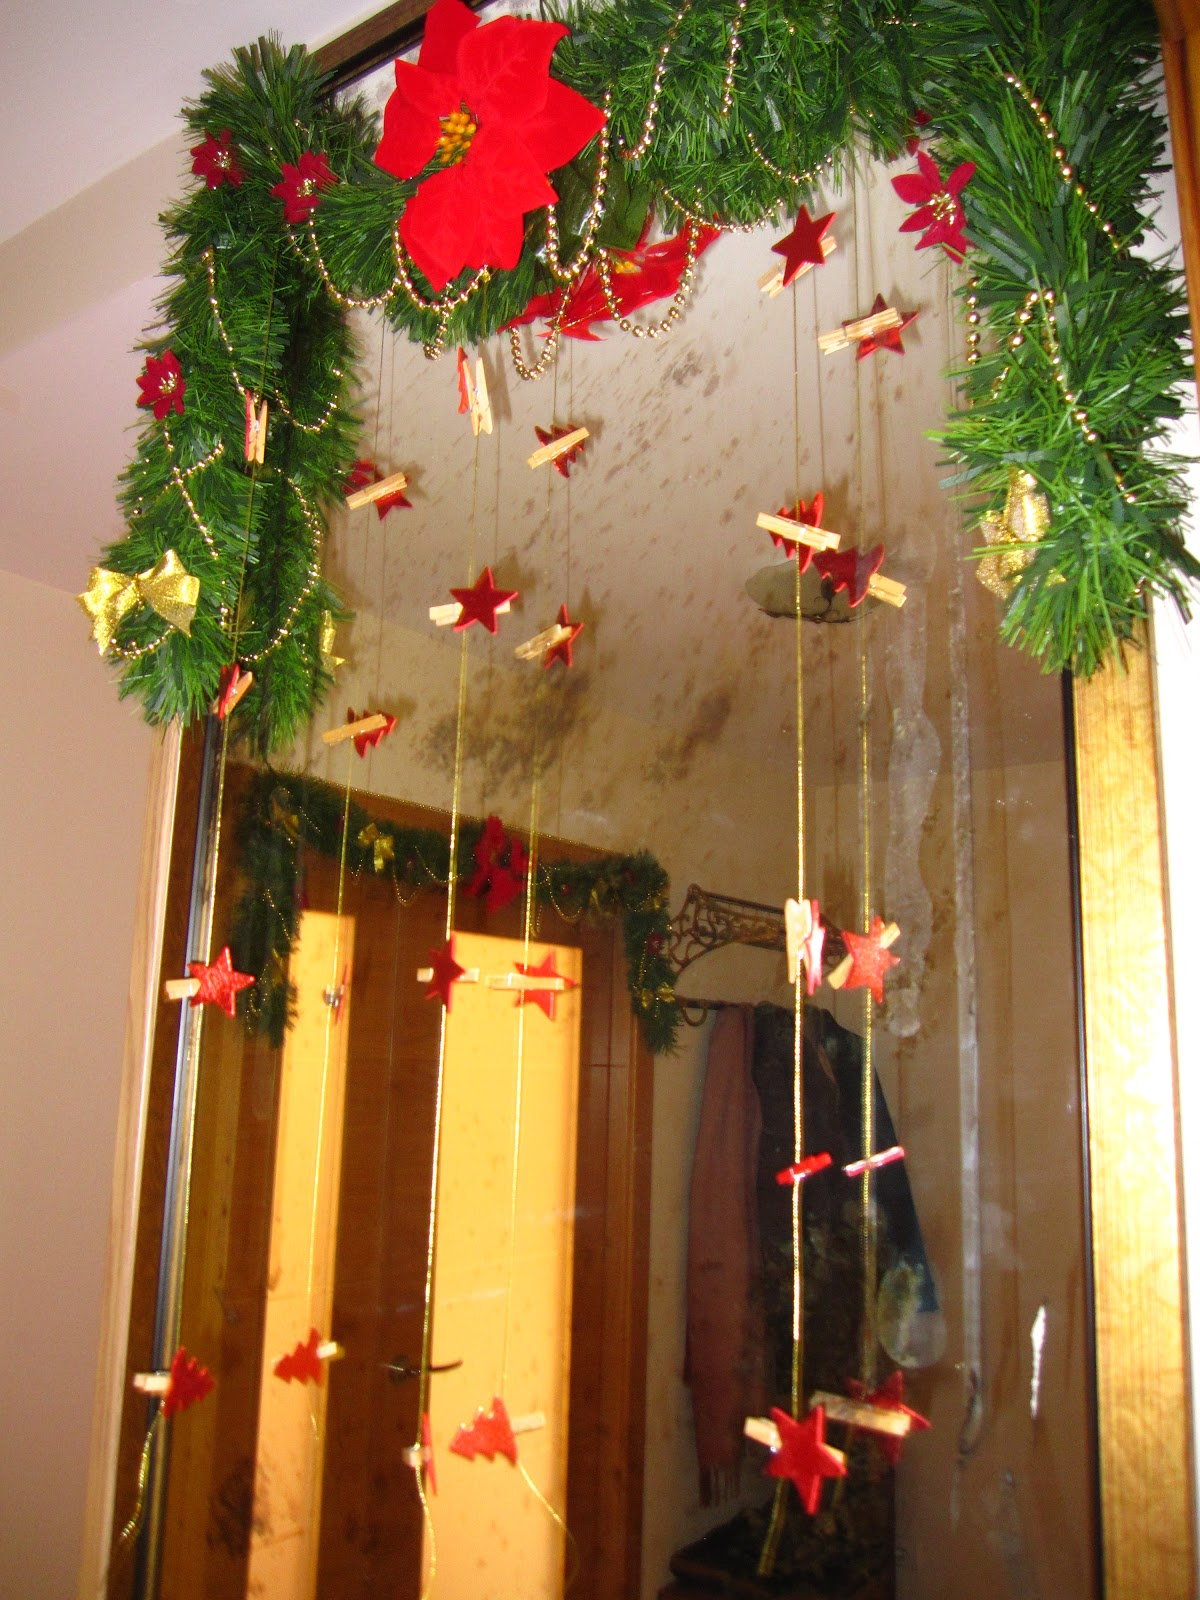 Decoraci nes navide as para puertas imagui - Decoracion para puertas ...